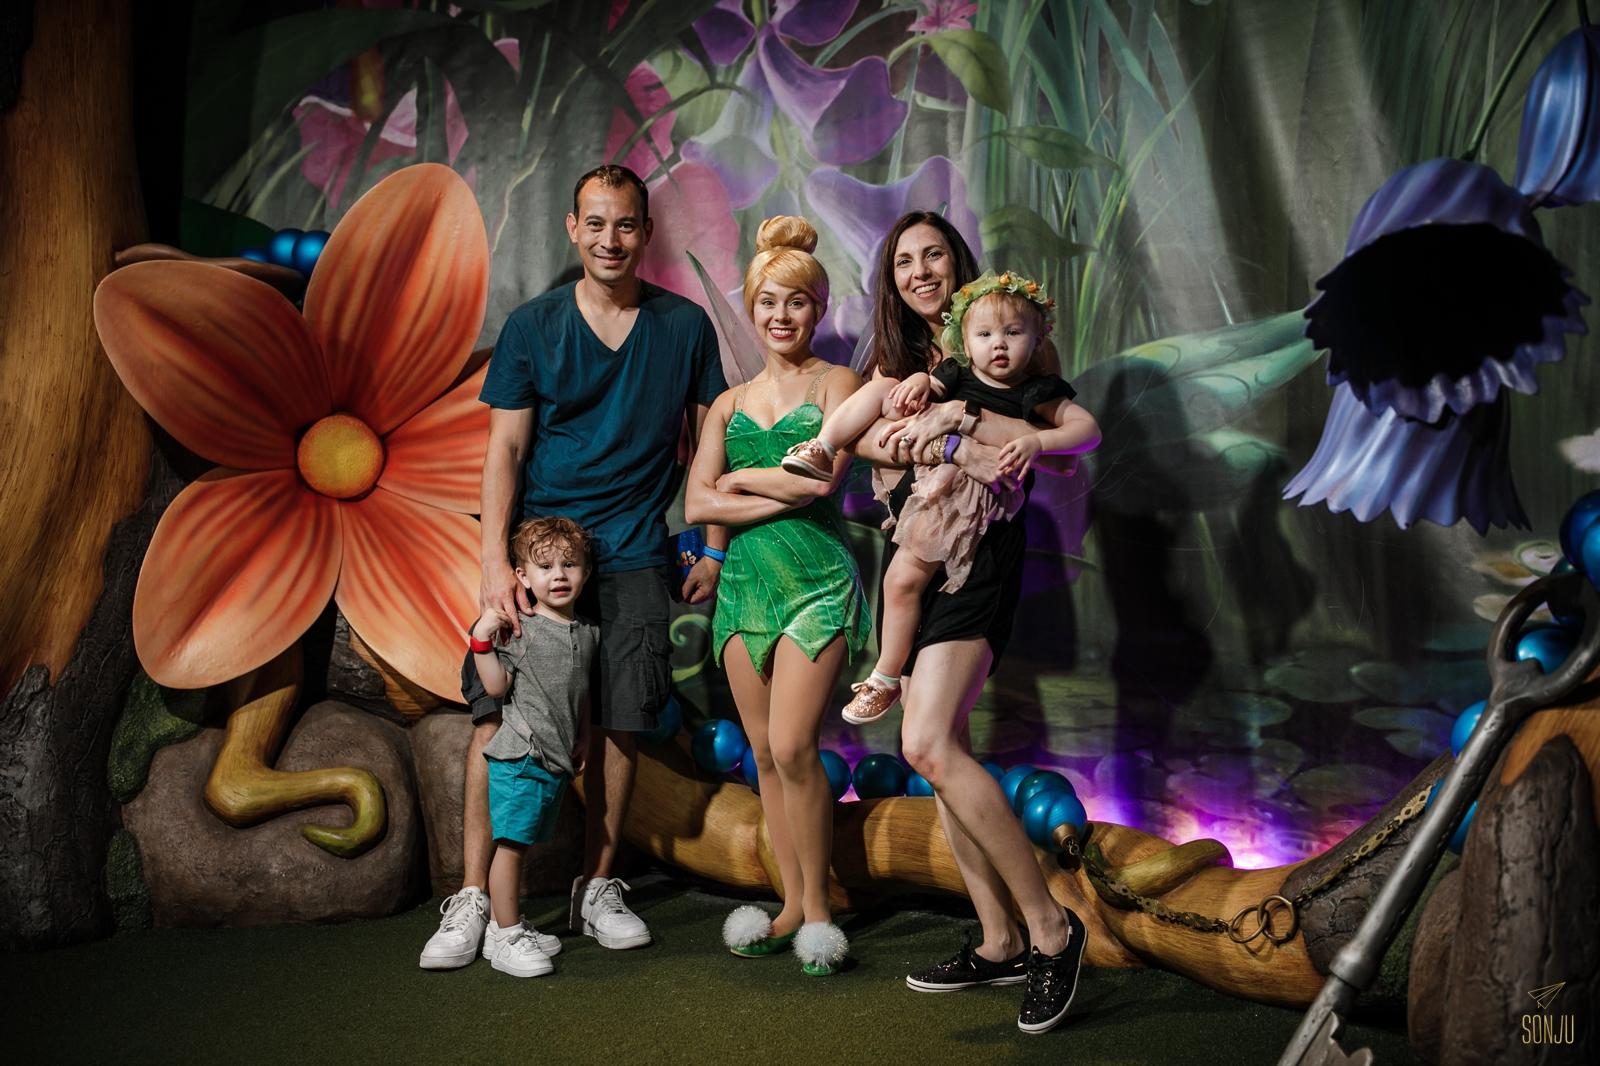 Central-Orlando-Theme-Park-Family-Photography00031.jpg